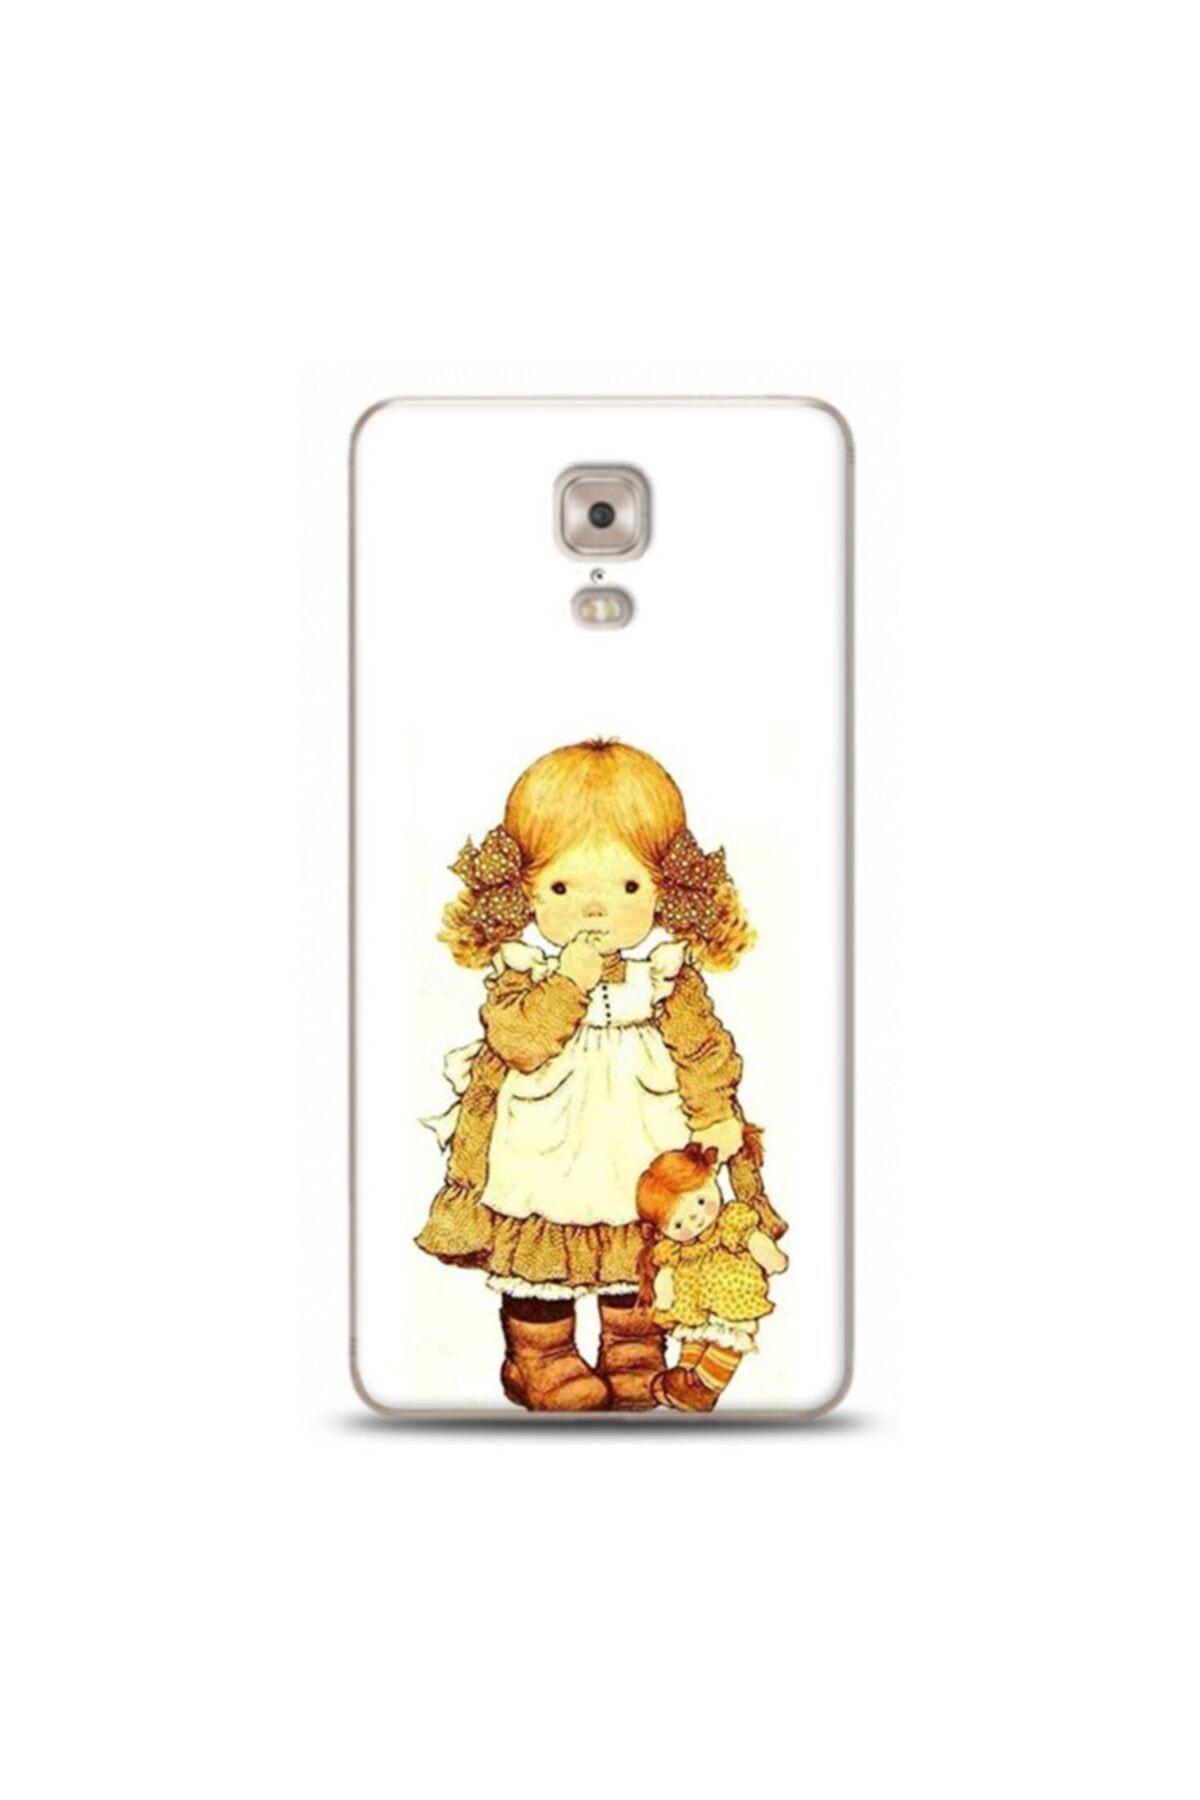 EXCLUSIVE Casper Via A1 Plus Bebekli Bebek Desenli Telefon Kılıfı 1